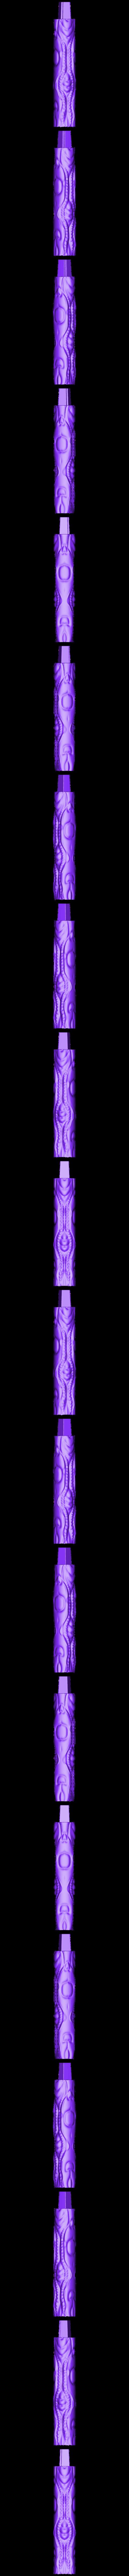 Aquaman_weapon_09.stl Download STL file Aquaman Trident Cosplay STL files - Costume Weapons 3D Printing • 3D printing design, 3DPrintModelStoreSS